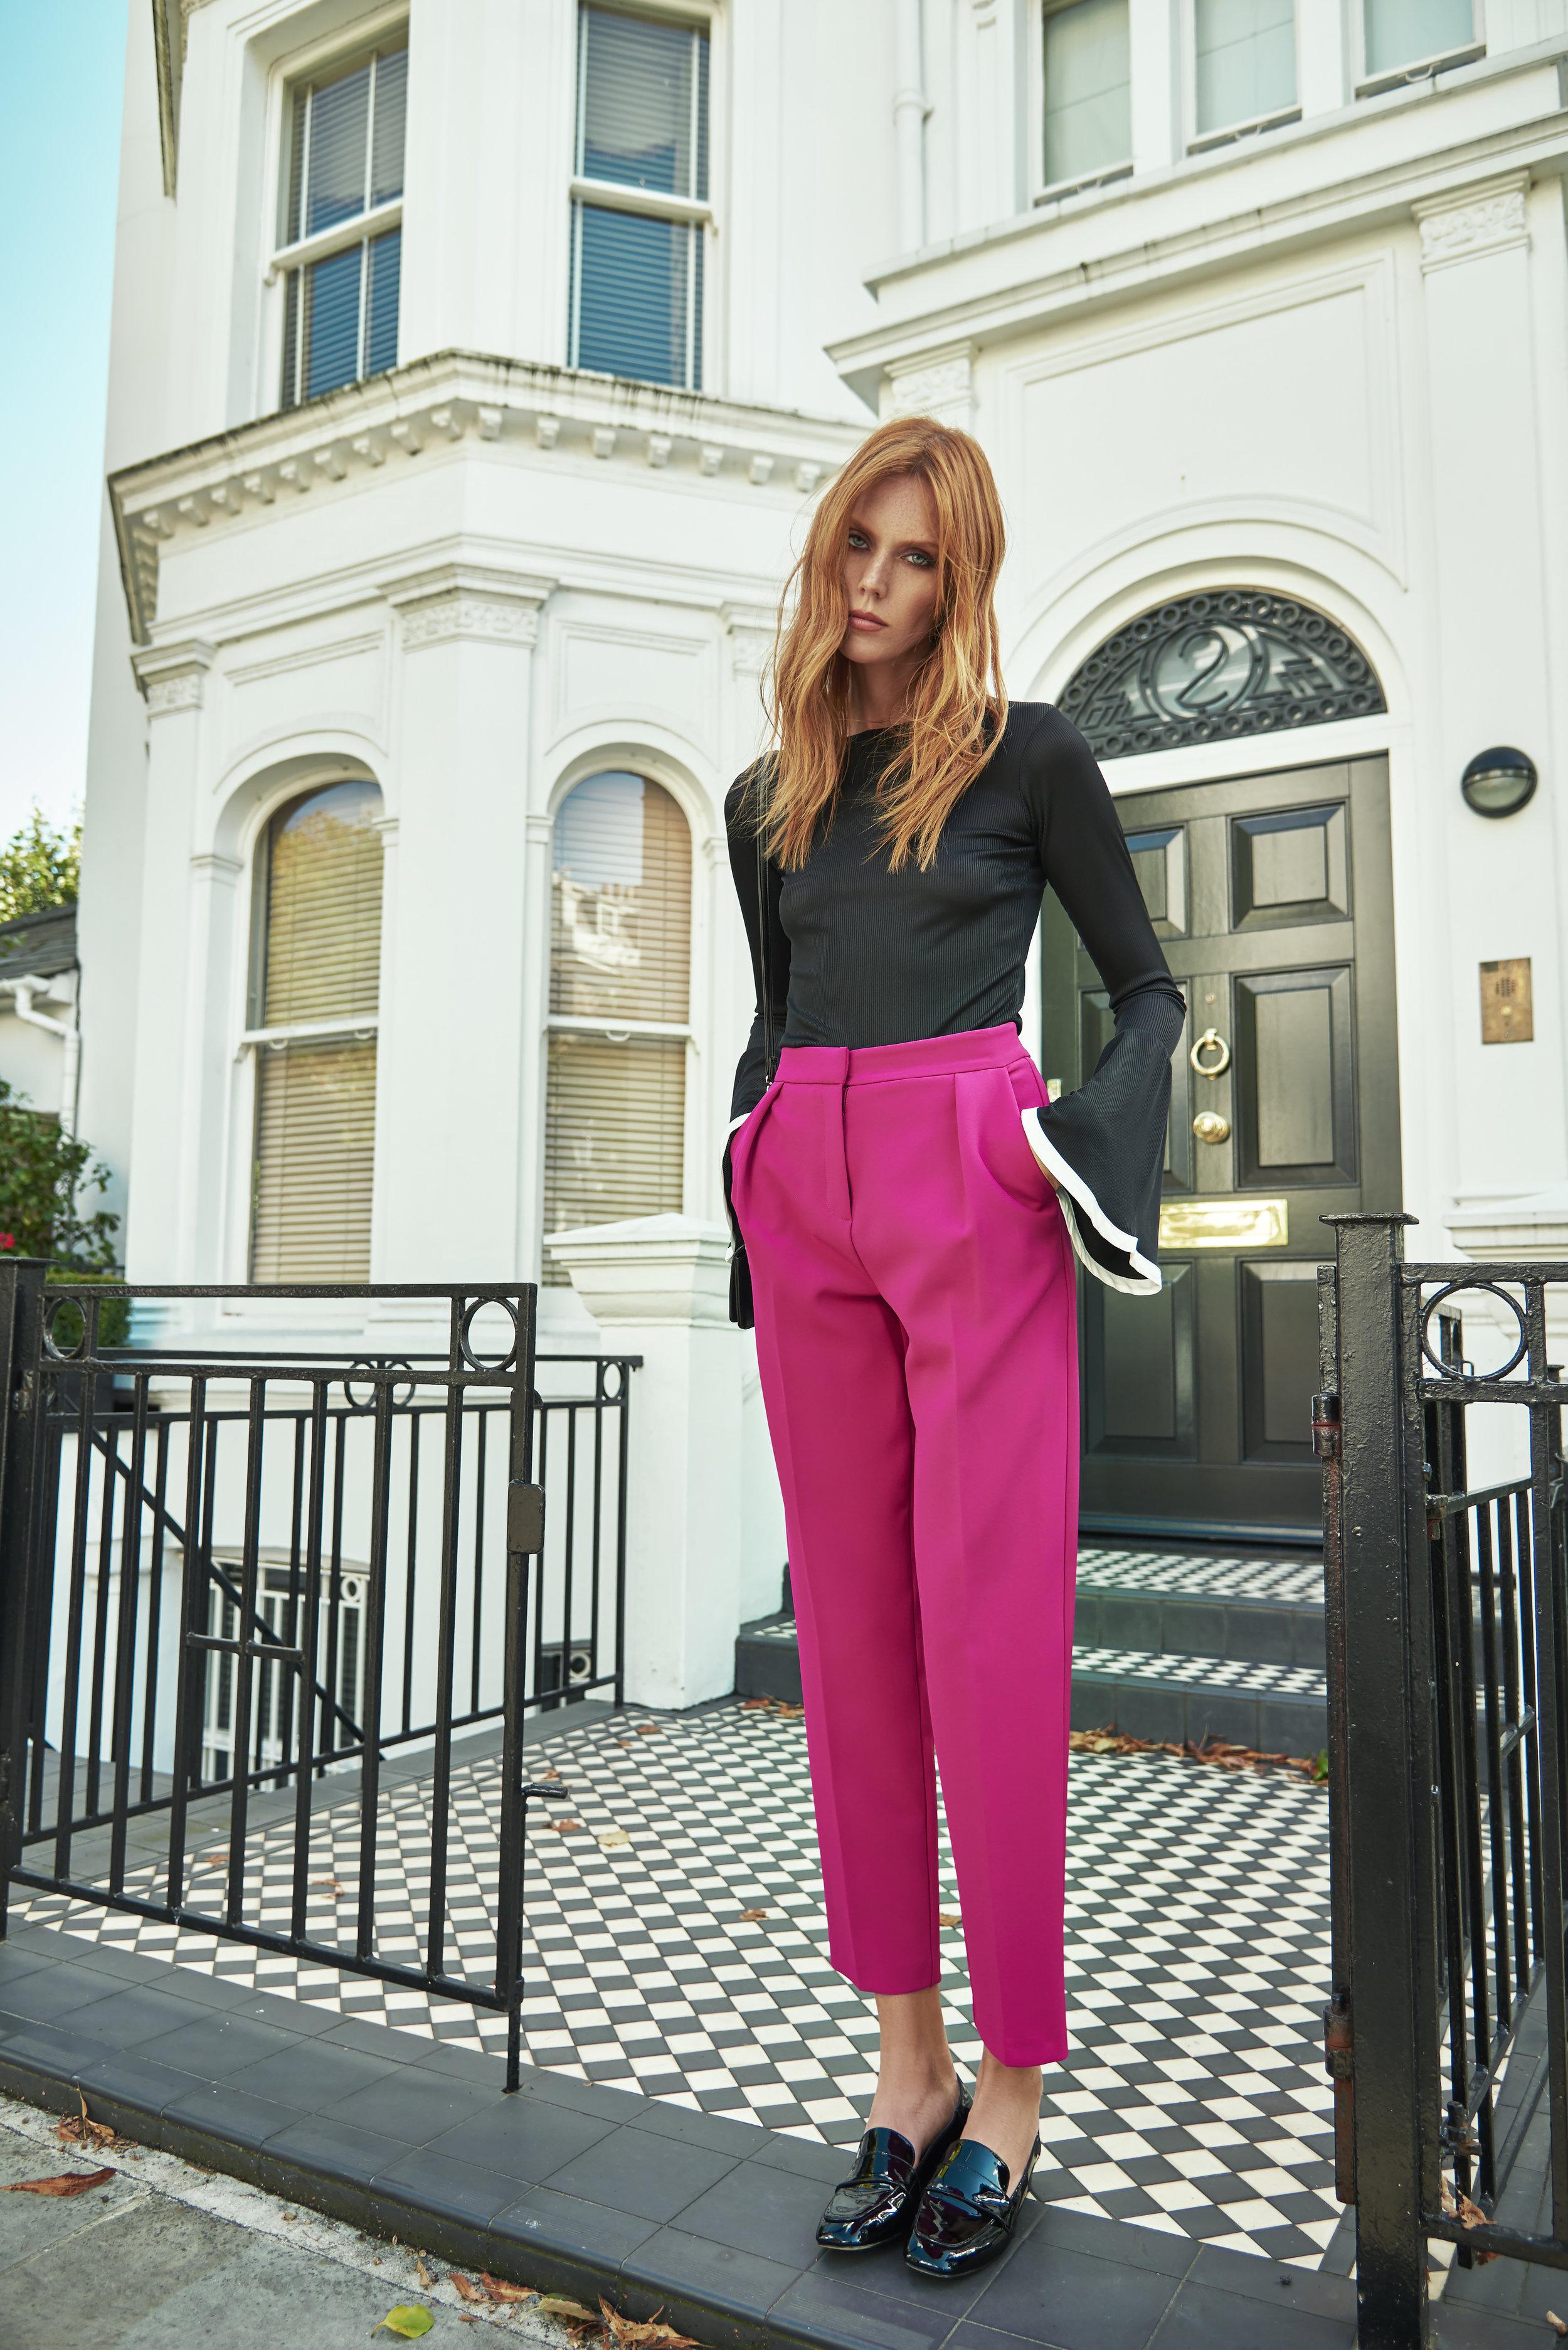 Top  Zara ,Trousers  Topshop ,Shoes  River Island